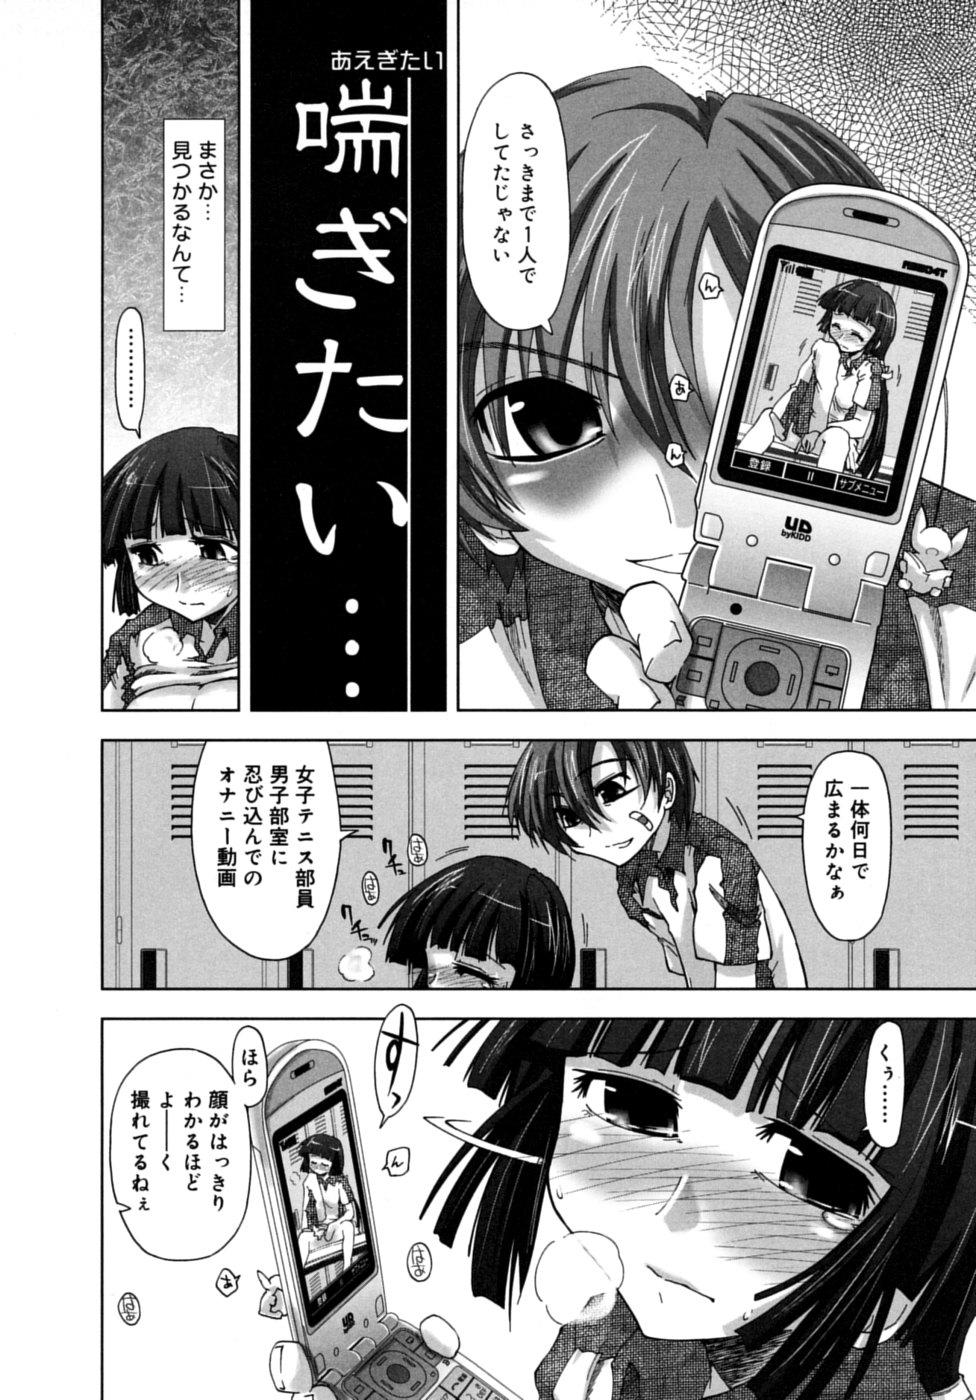 Houkago Shoujo - After School Girls 111